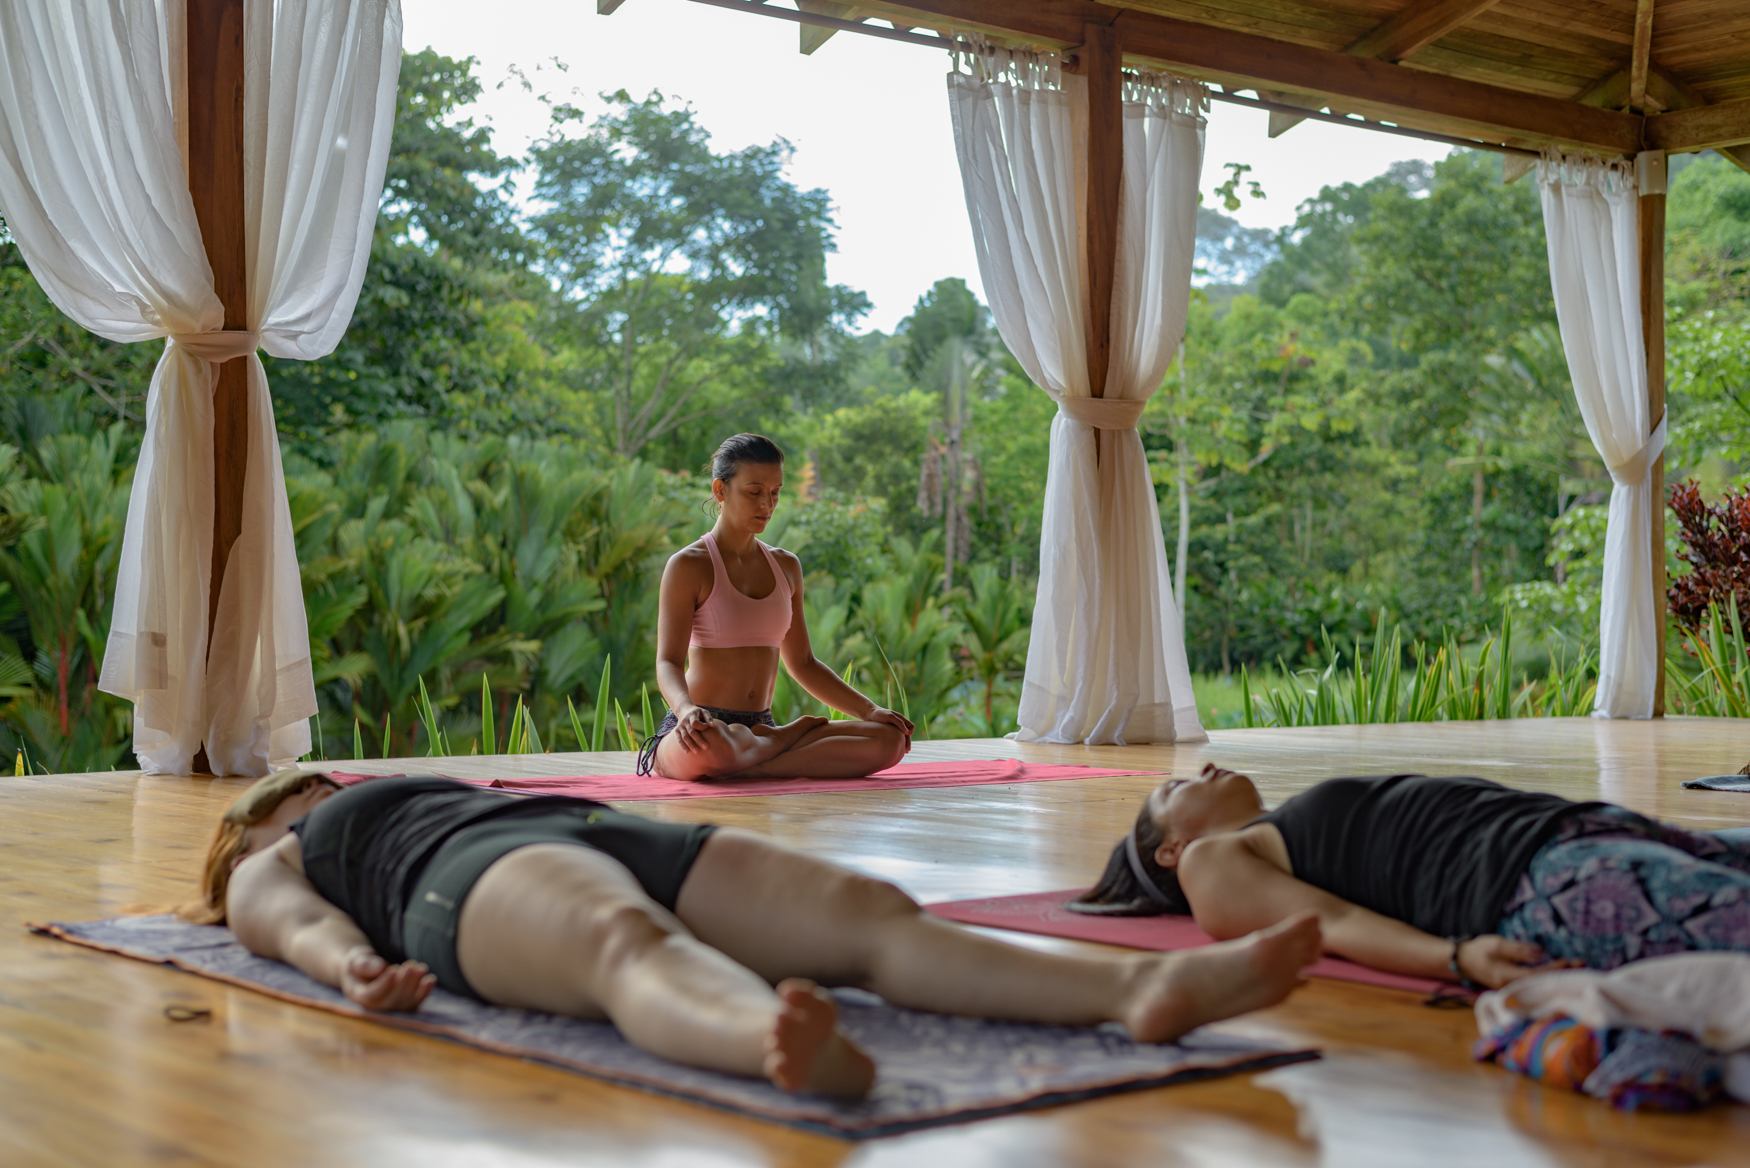 Yoga-Retreat-Photography-Costa-Rica-21.jpg